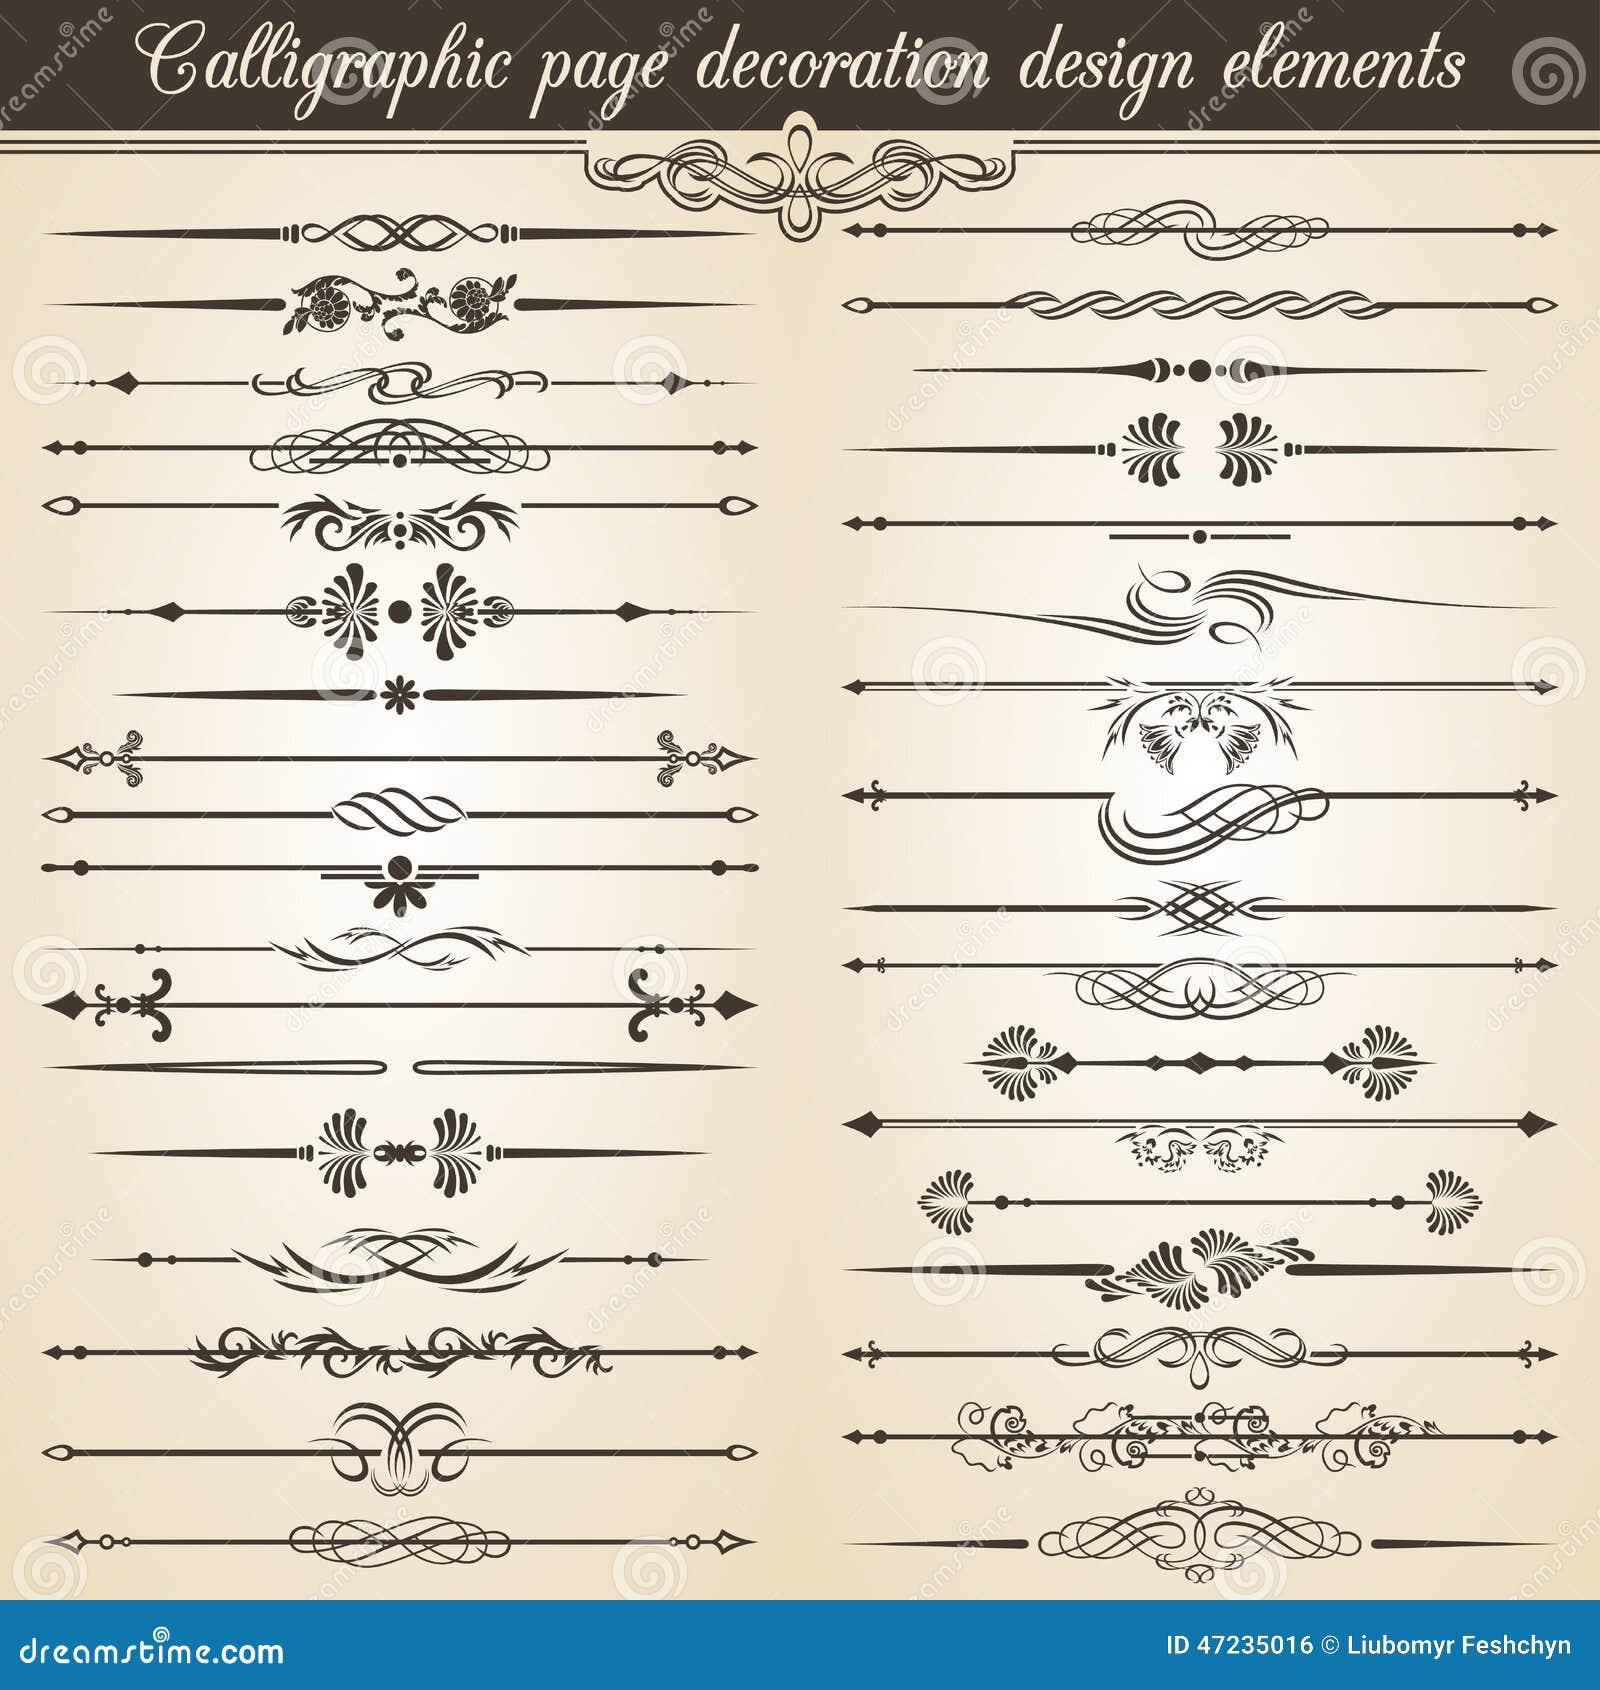 Calligraphic Vintage Page Decoration Design Elements